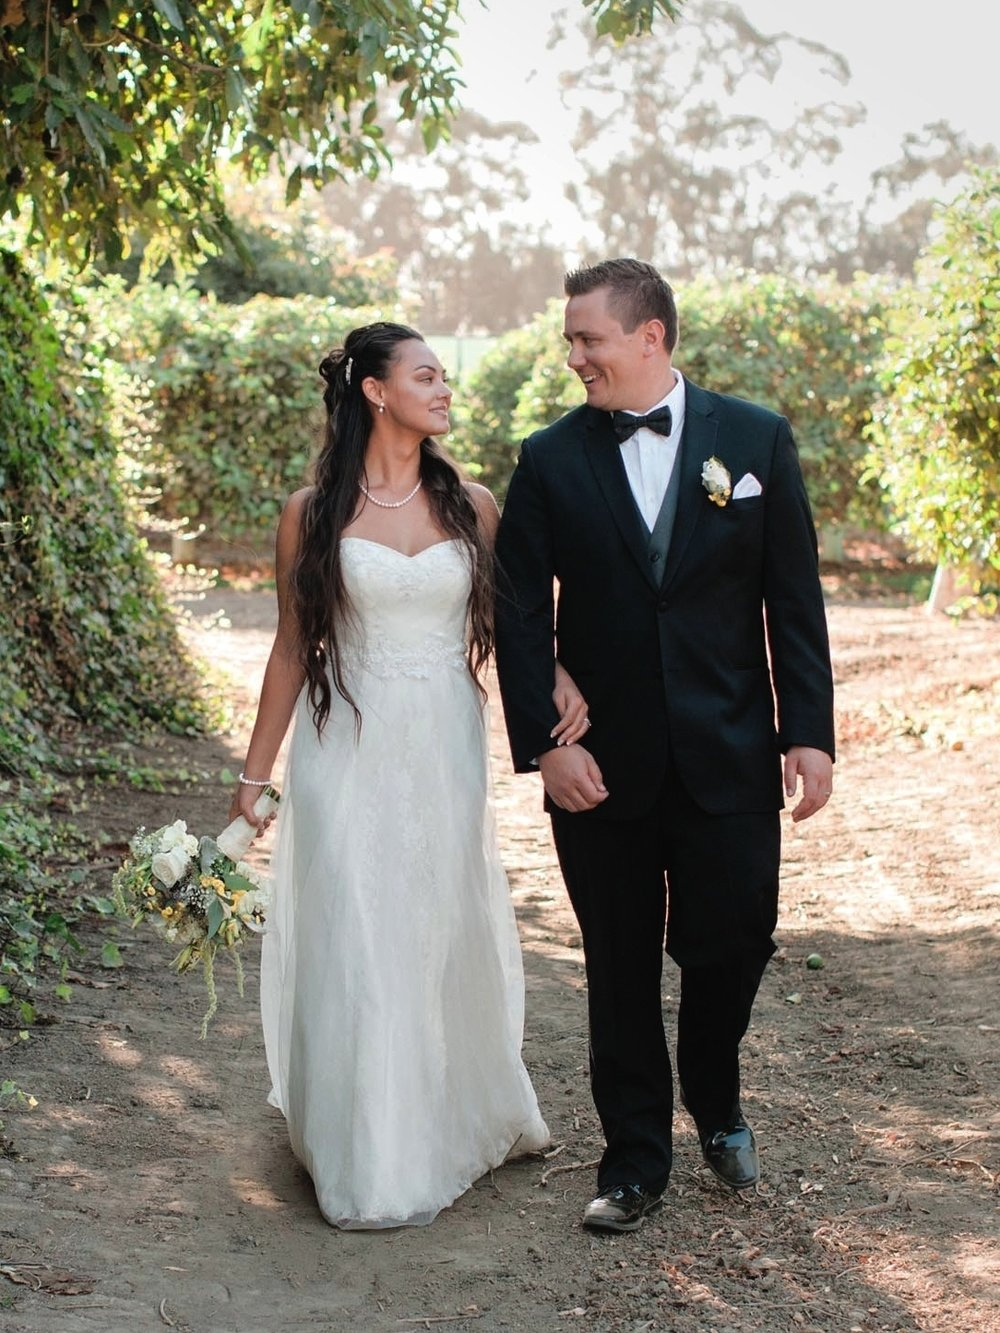 mcgrath-ranch-garden-wedding-venue-wisteria-photography-149-adjusted-b.jpg